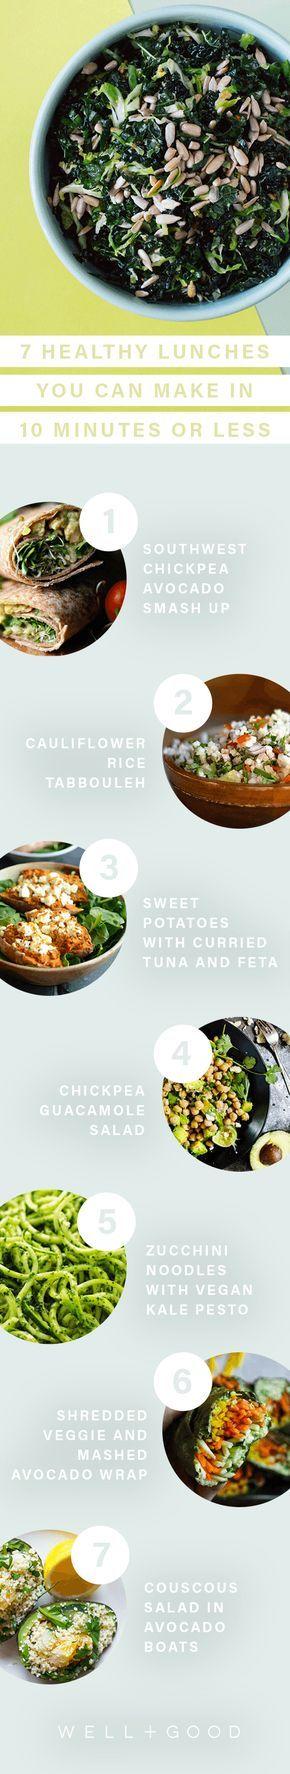 10 minuet healthy lunch recipe ideas